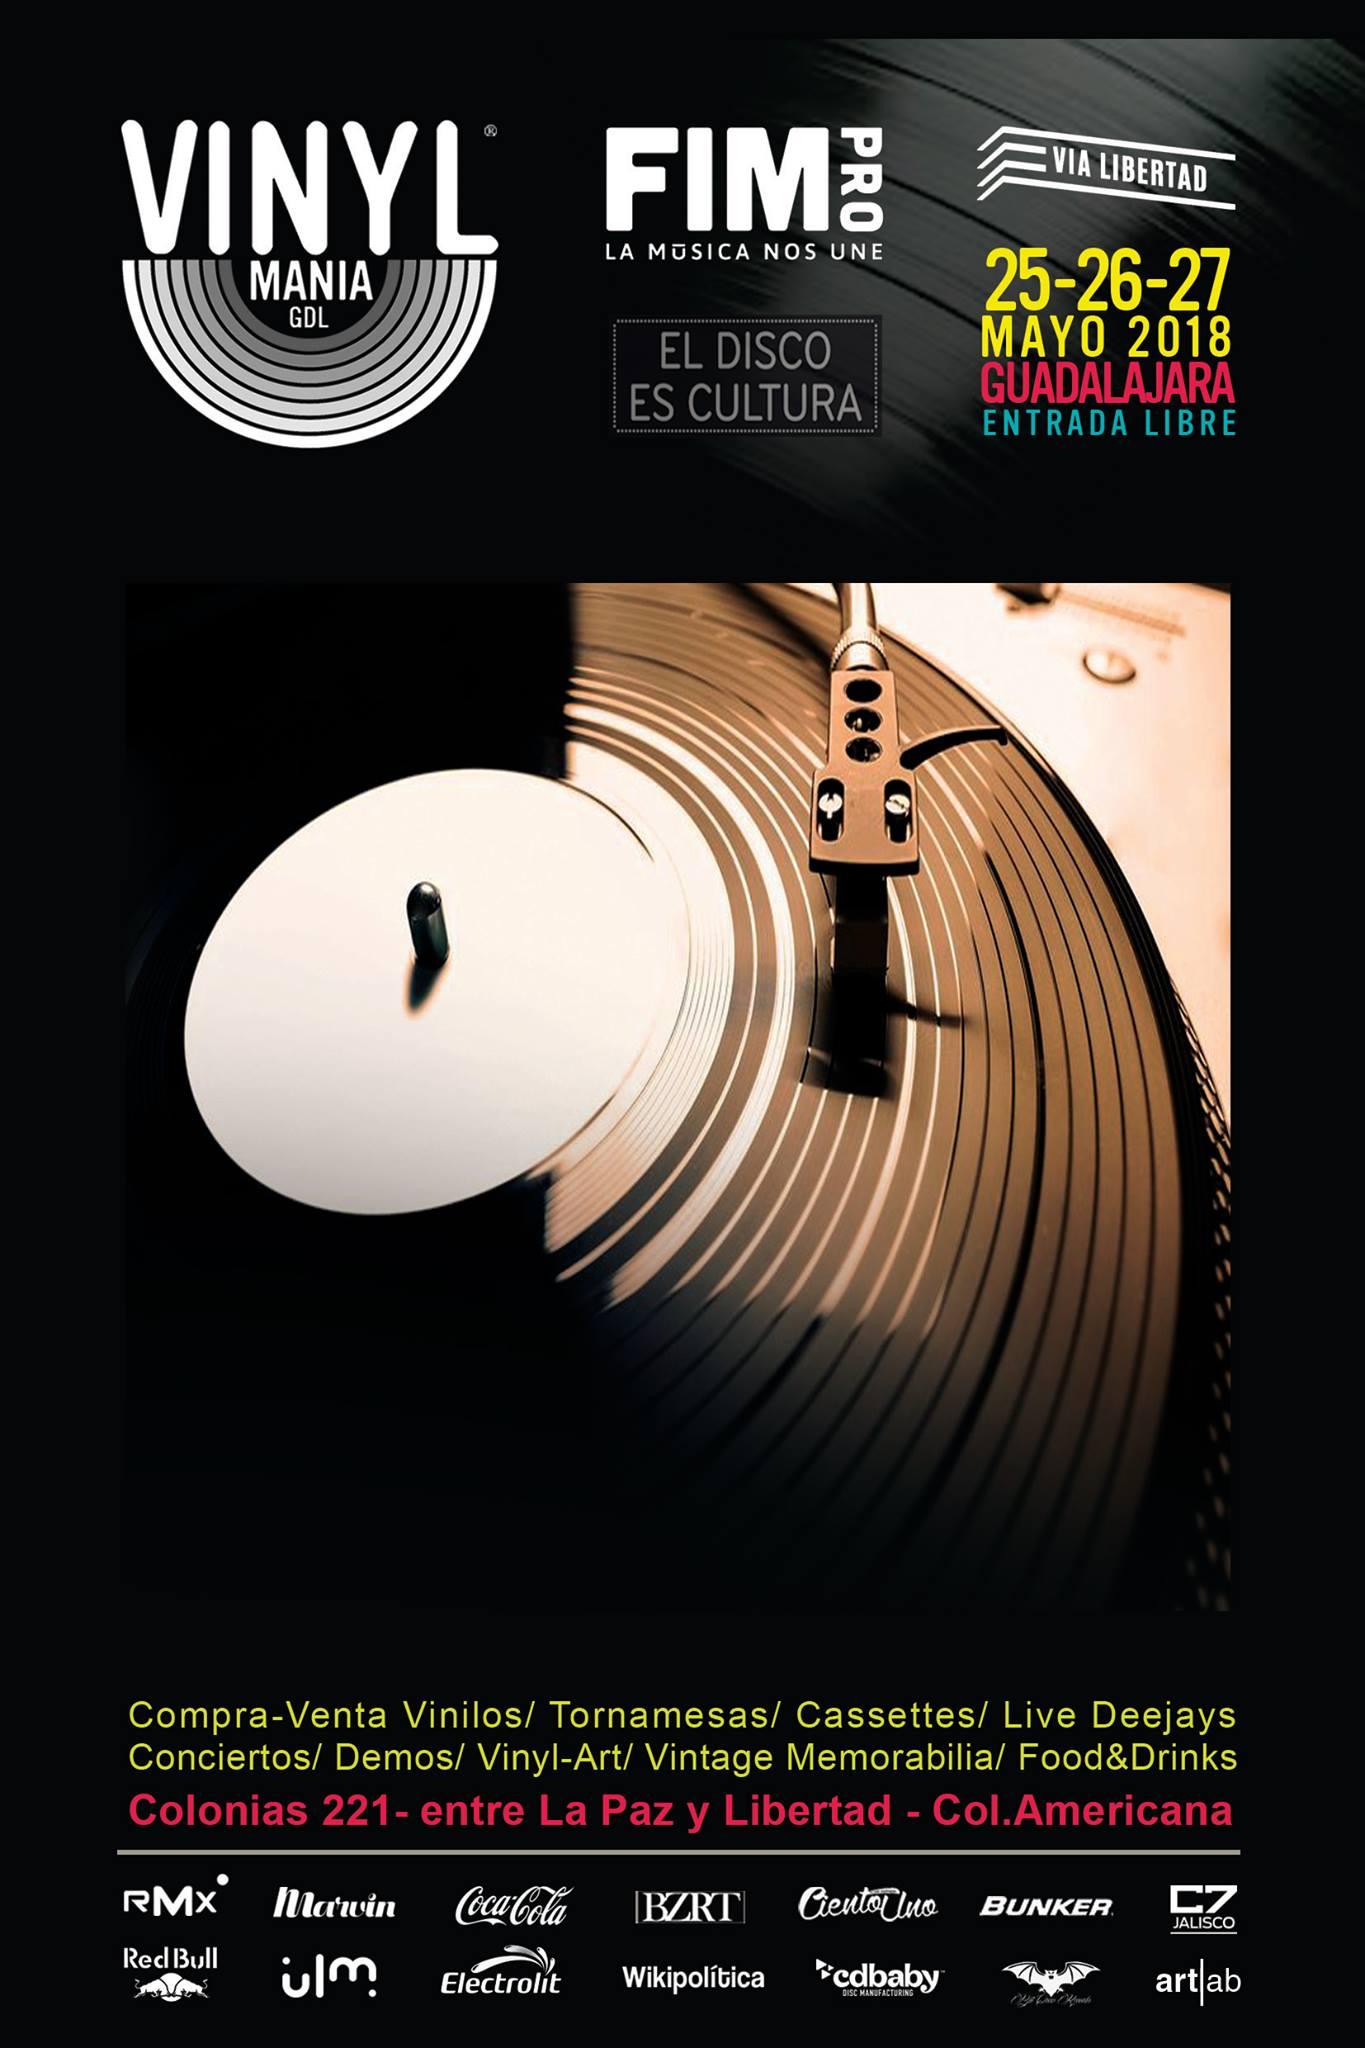 Vinylmania Guadalajara